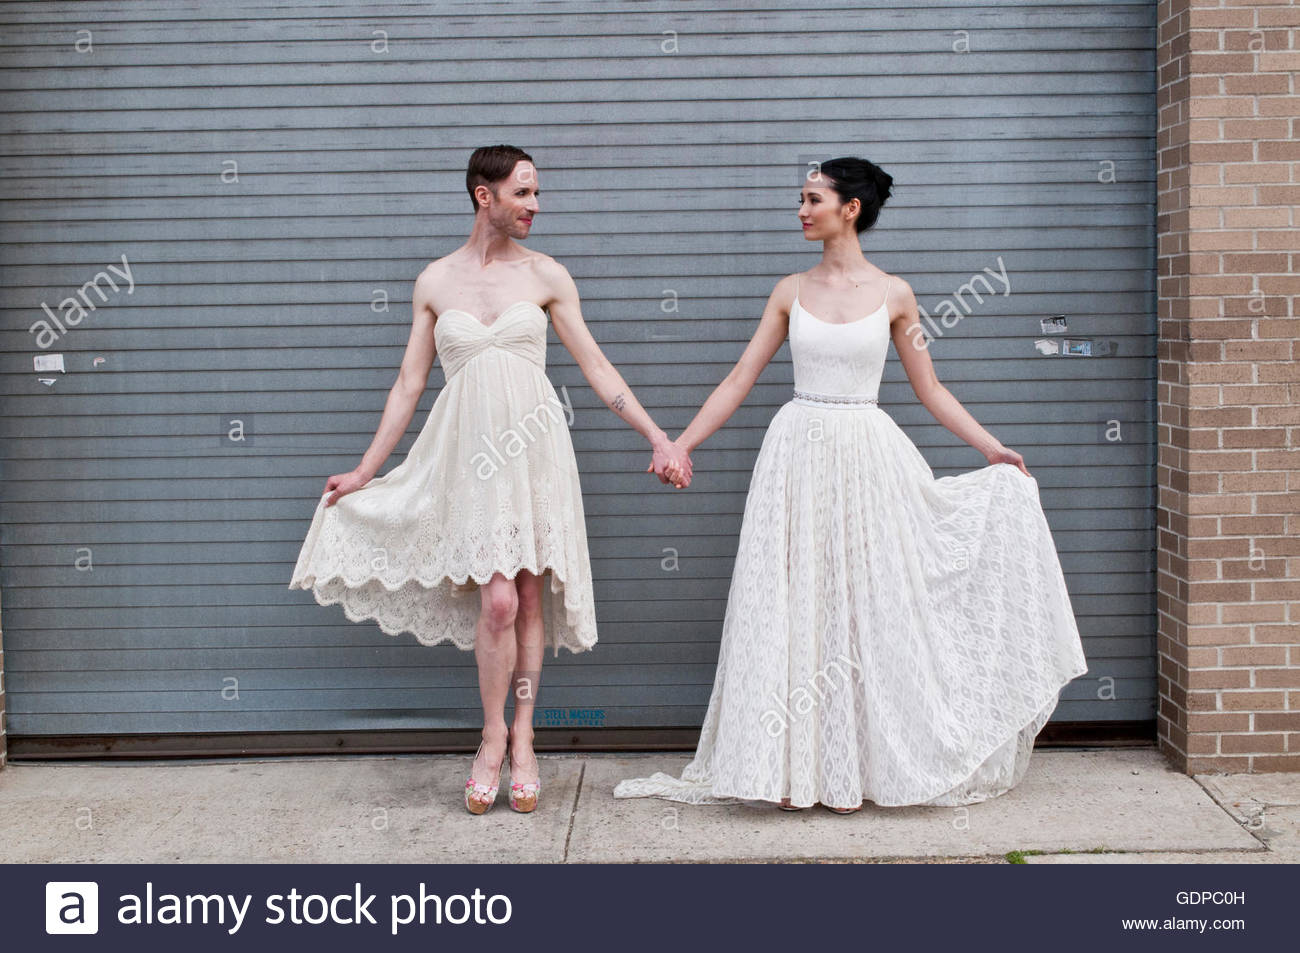 Gender fluid model and female model showing off cotton wedding dresses - Stock Image